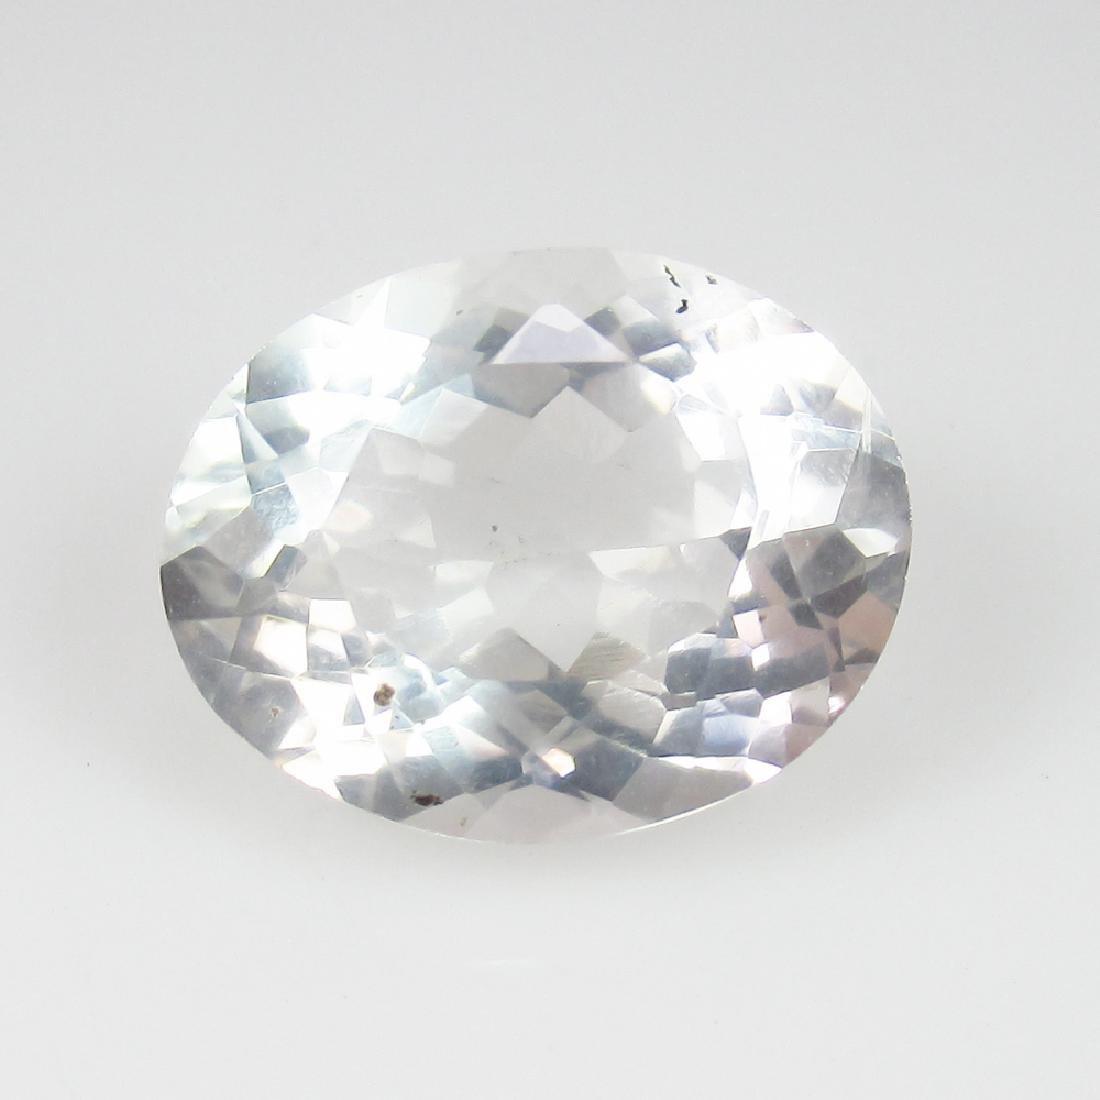 4.73 Ctw Natural Loose Rock Crystal Nice Oval Cut